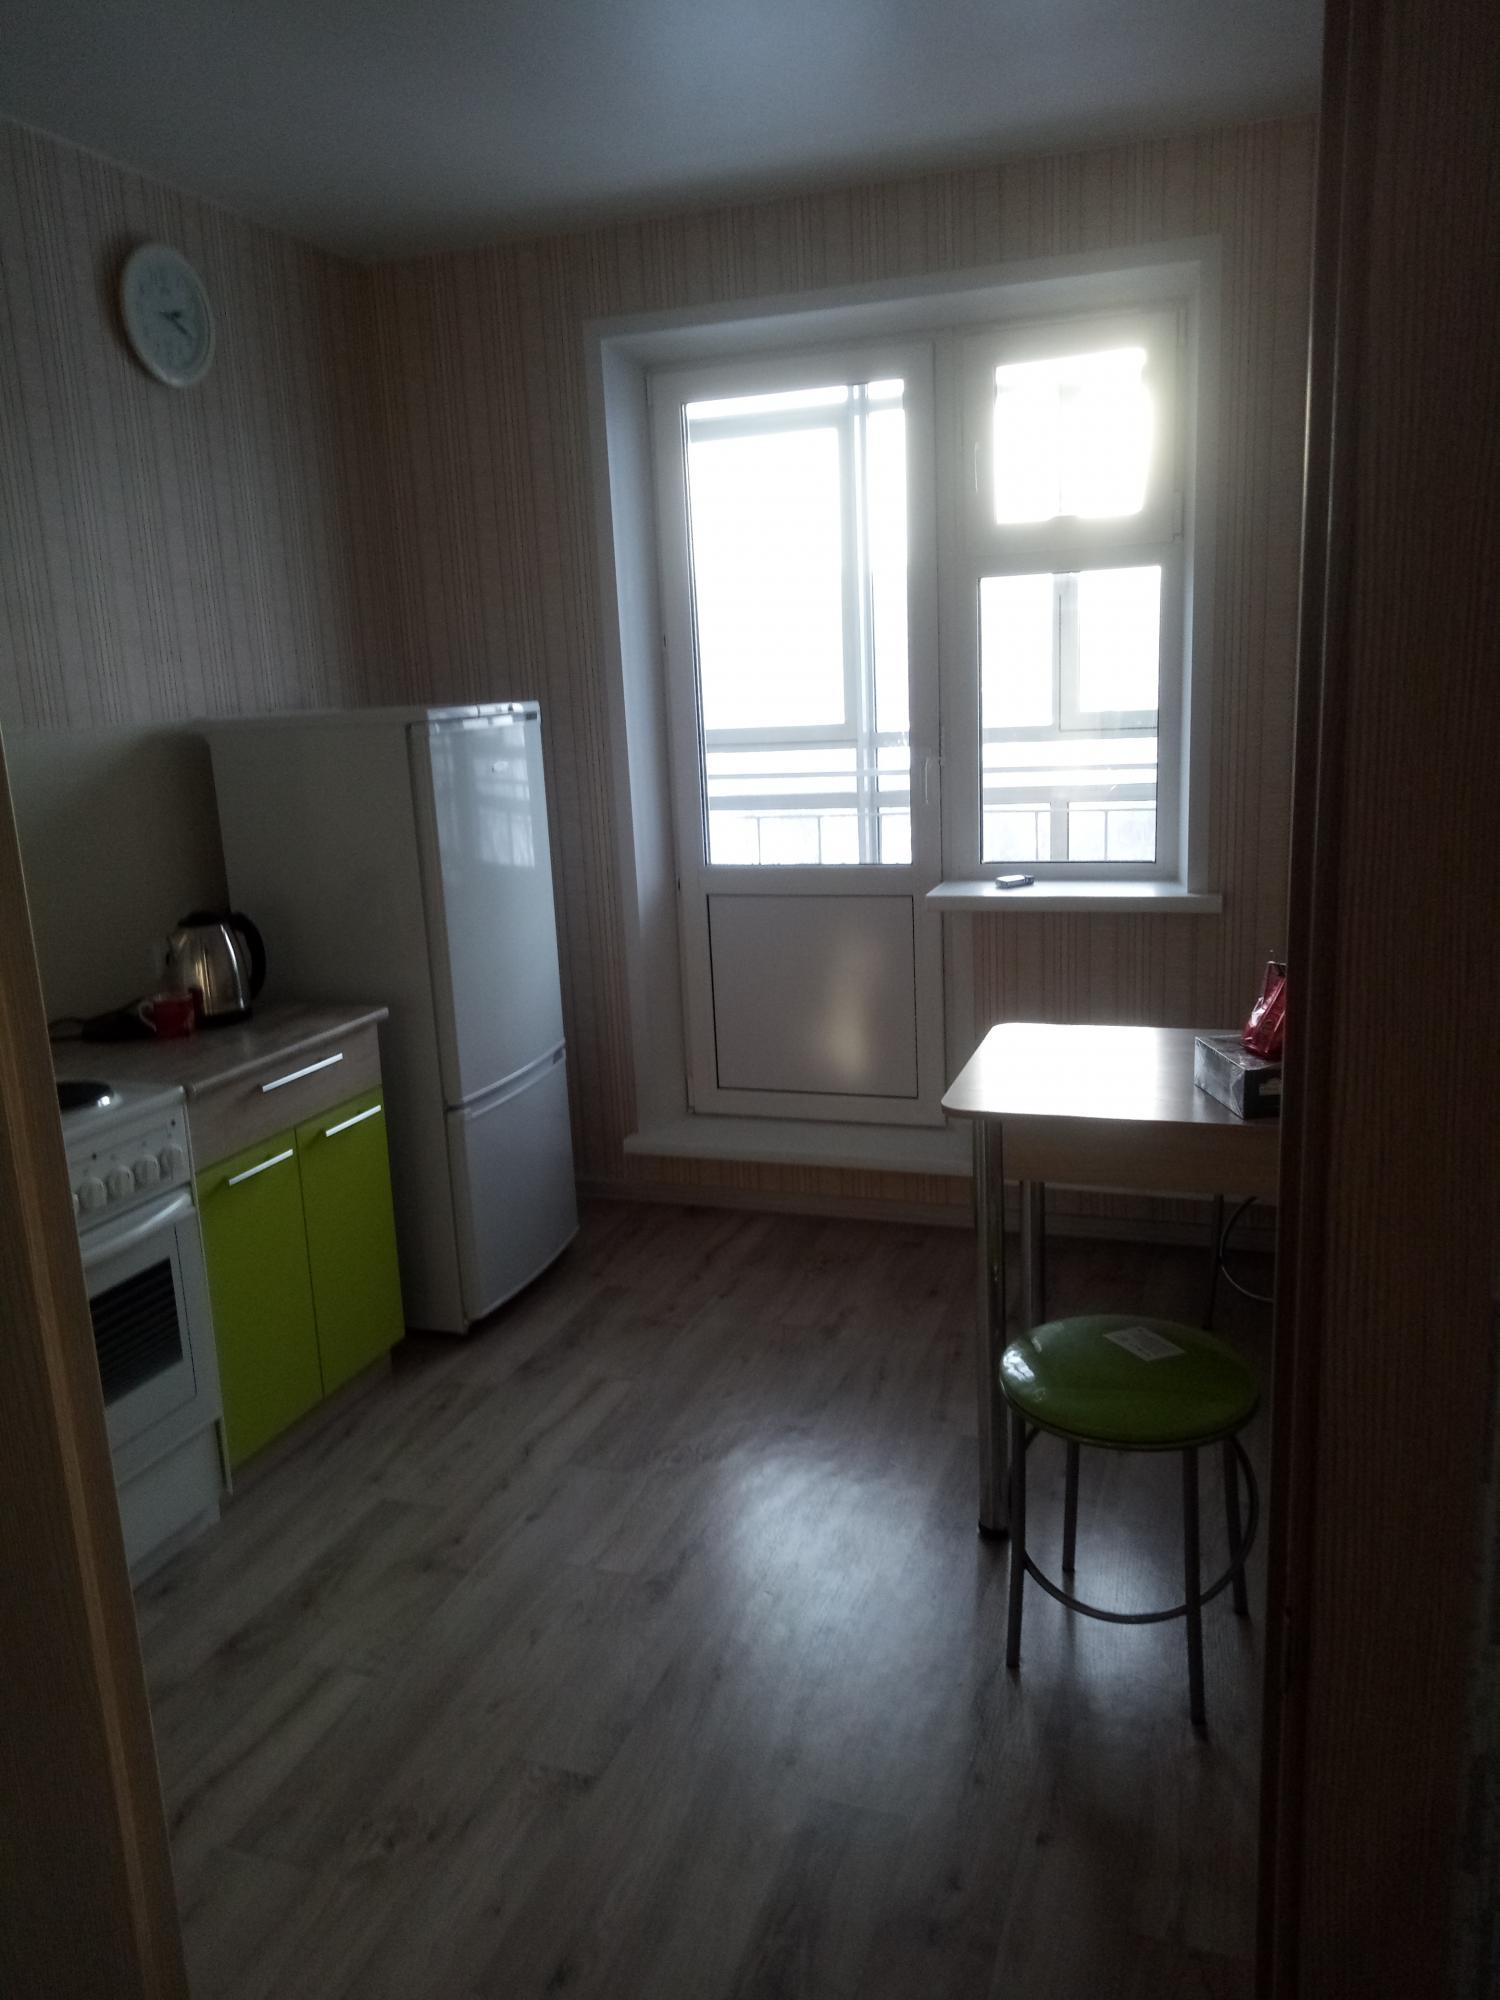 2к квартира Лесопарковая улица, д.17а | 21000 | аренда в Красноярске фото 5